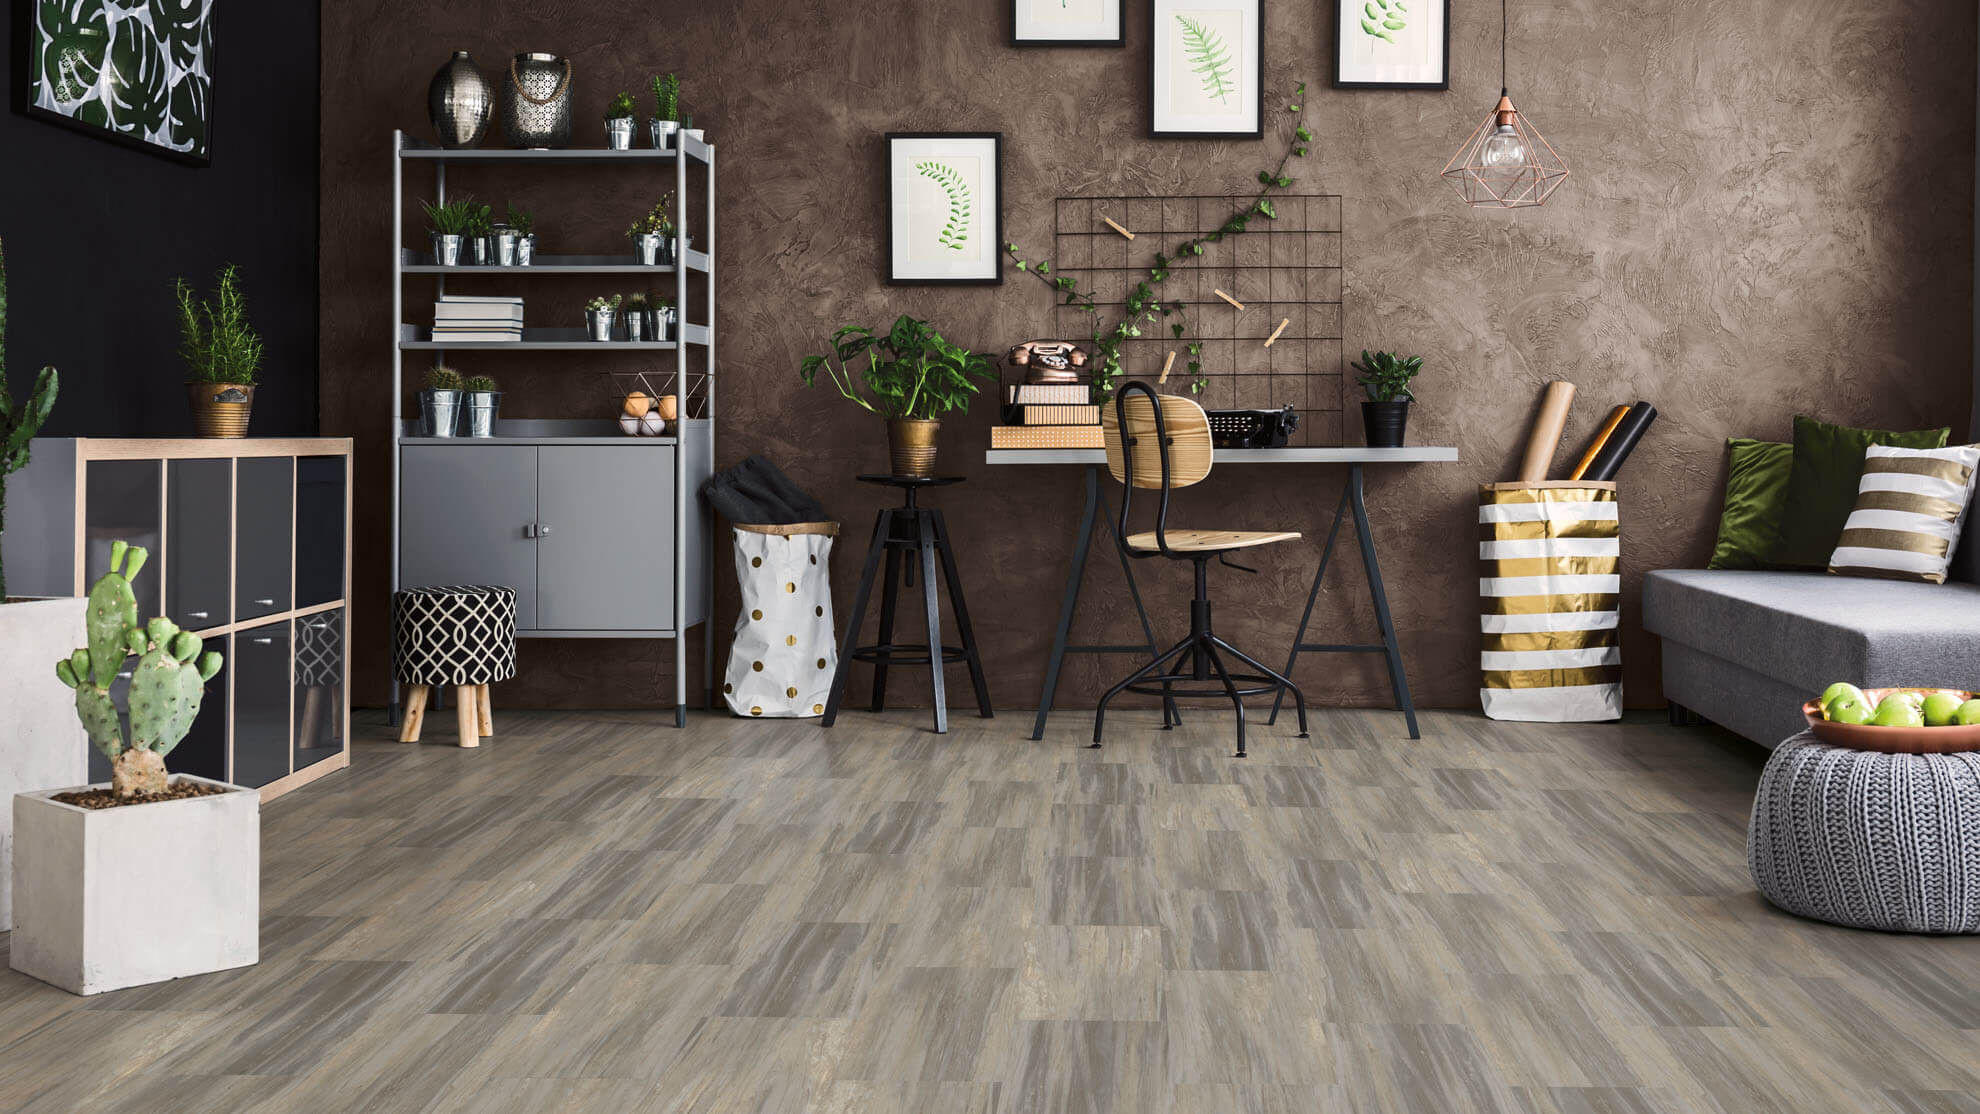 hardwood floor showroom nyc of earthwerks flooring in parkhill tile pkt 371